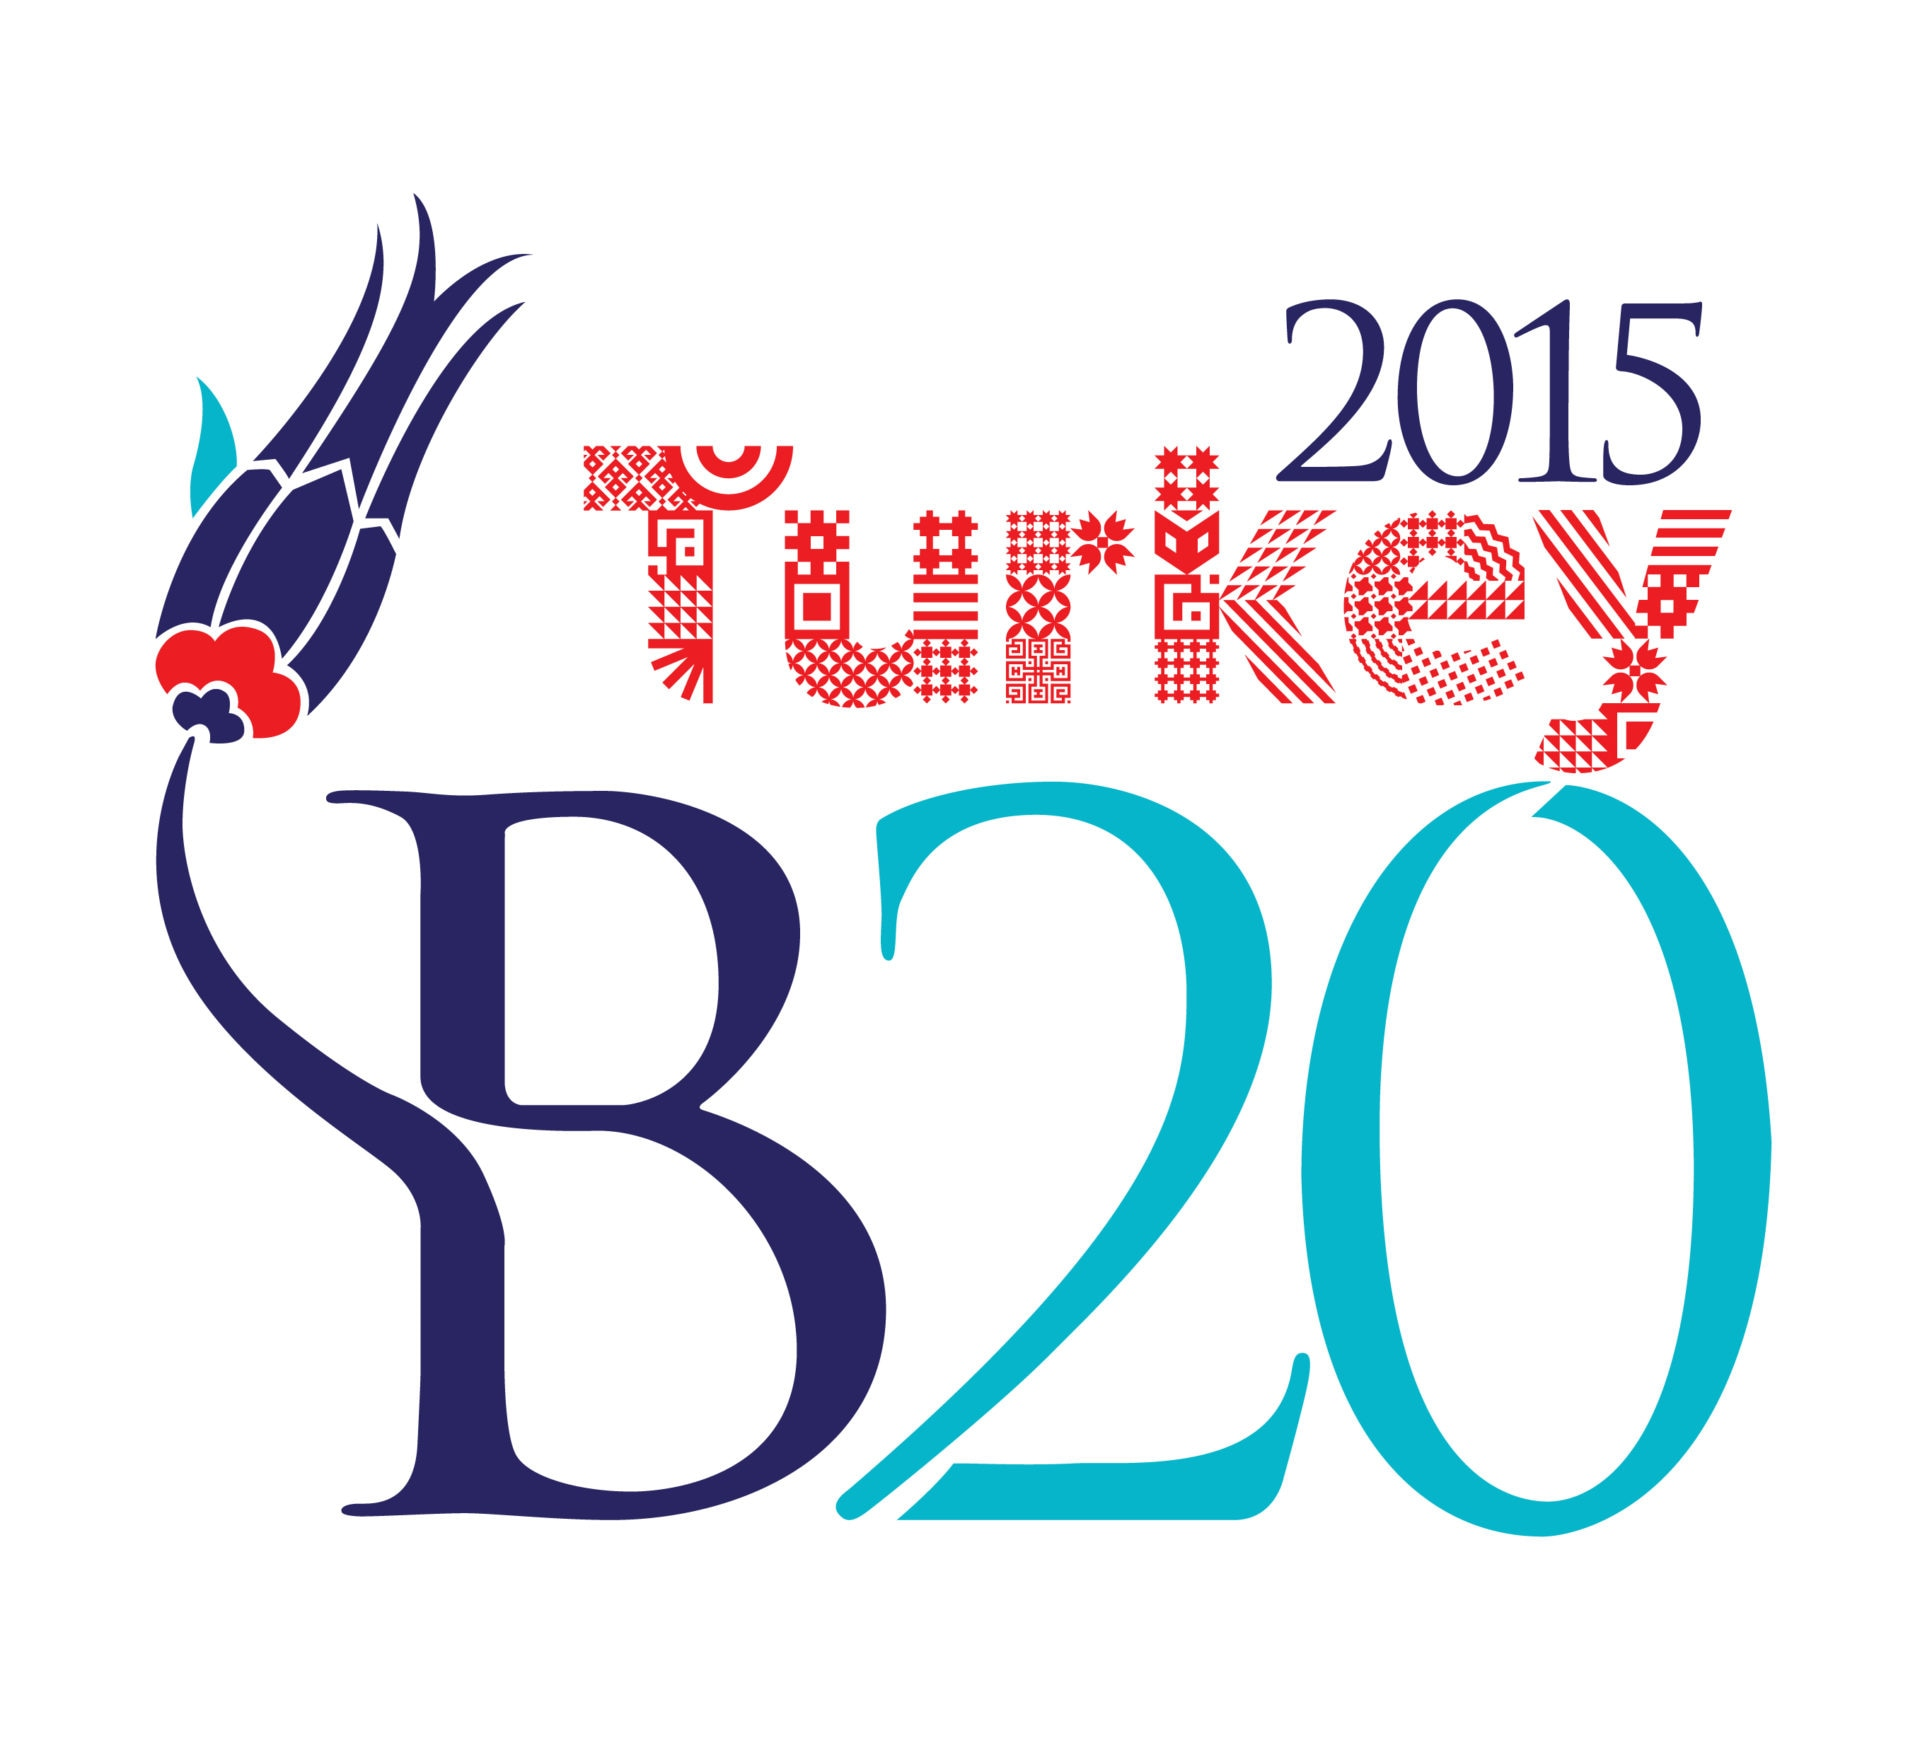 B20 logo